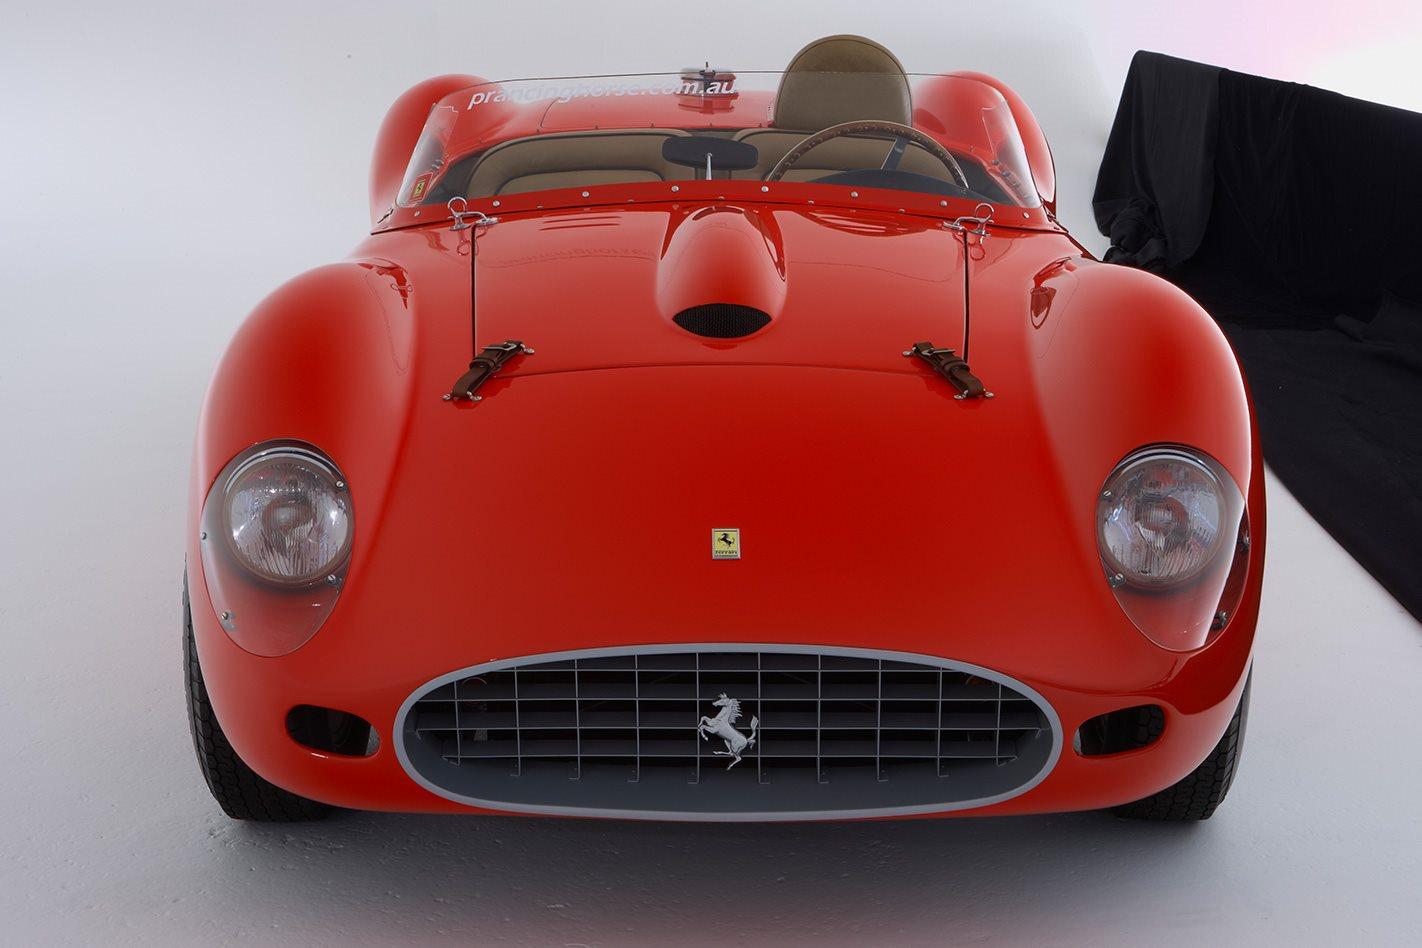 1959 ferrari 250 testa rossa legend series motor 1959 ferrari 250 testa rossa vanachro Gallery